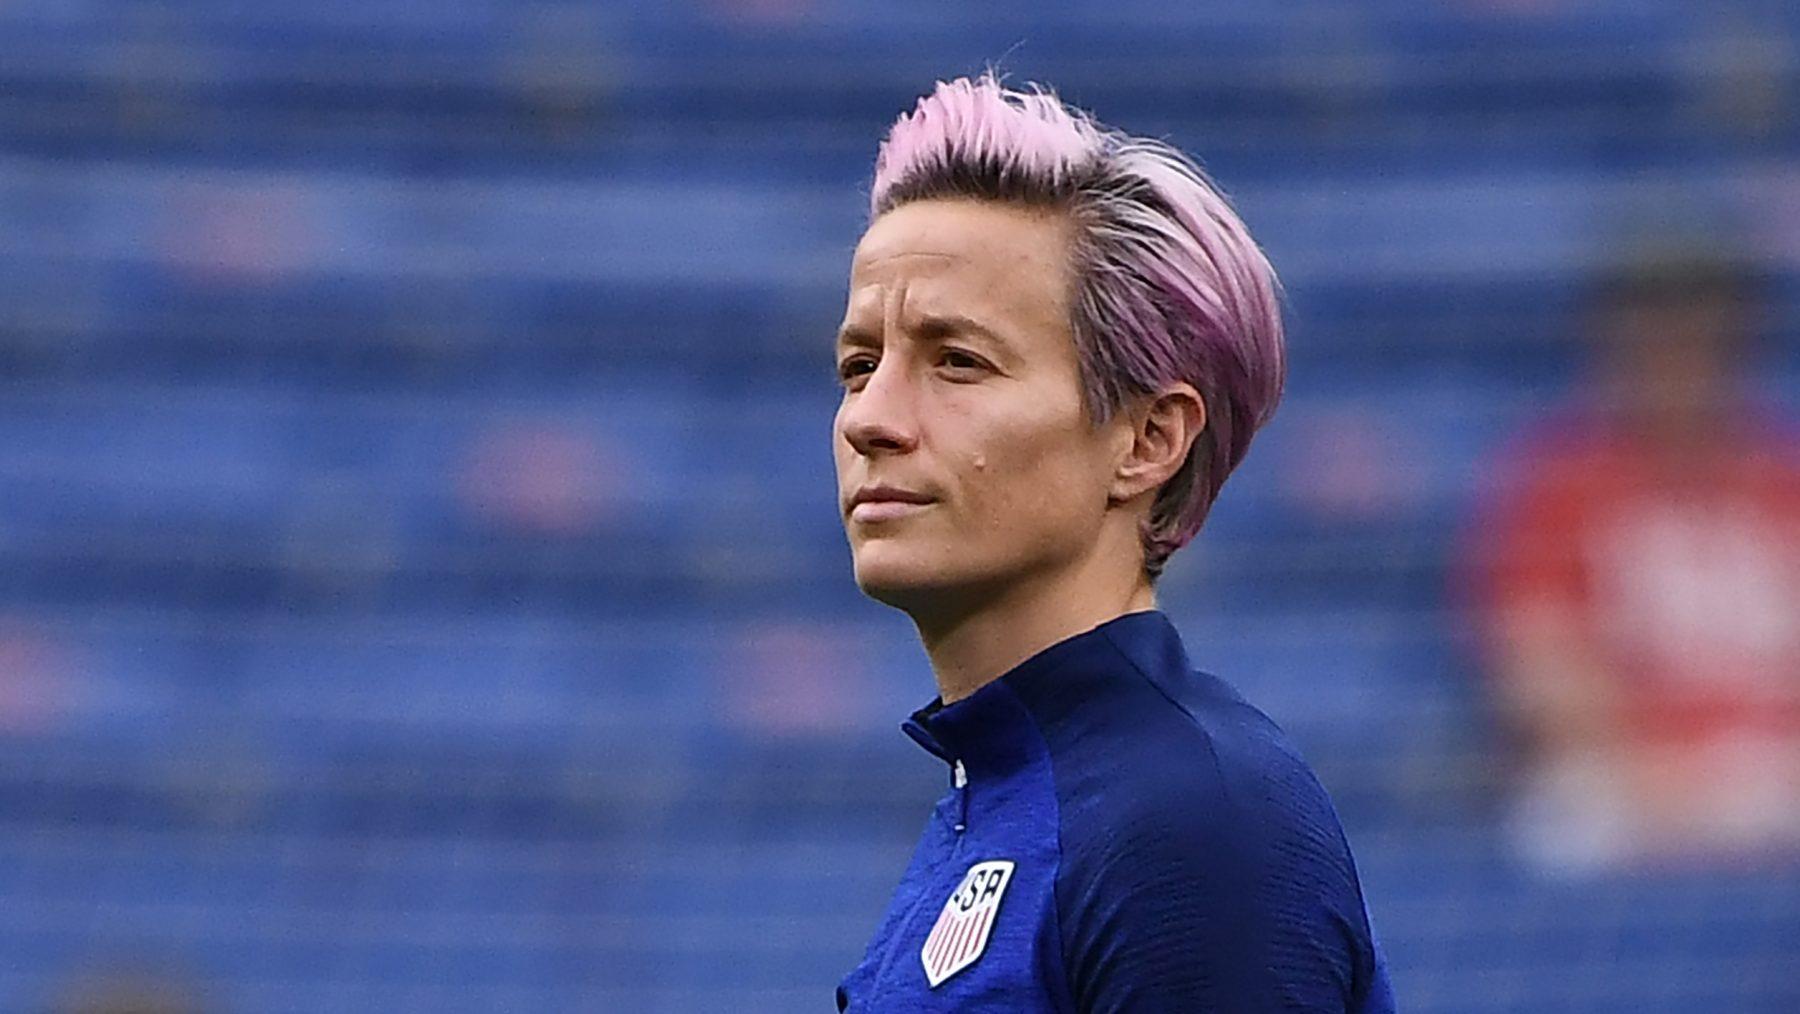 megan-rapinoe-voetbal-trump-lesbisch